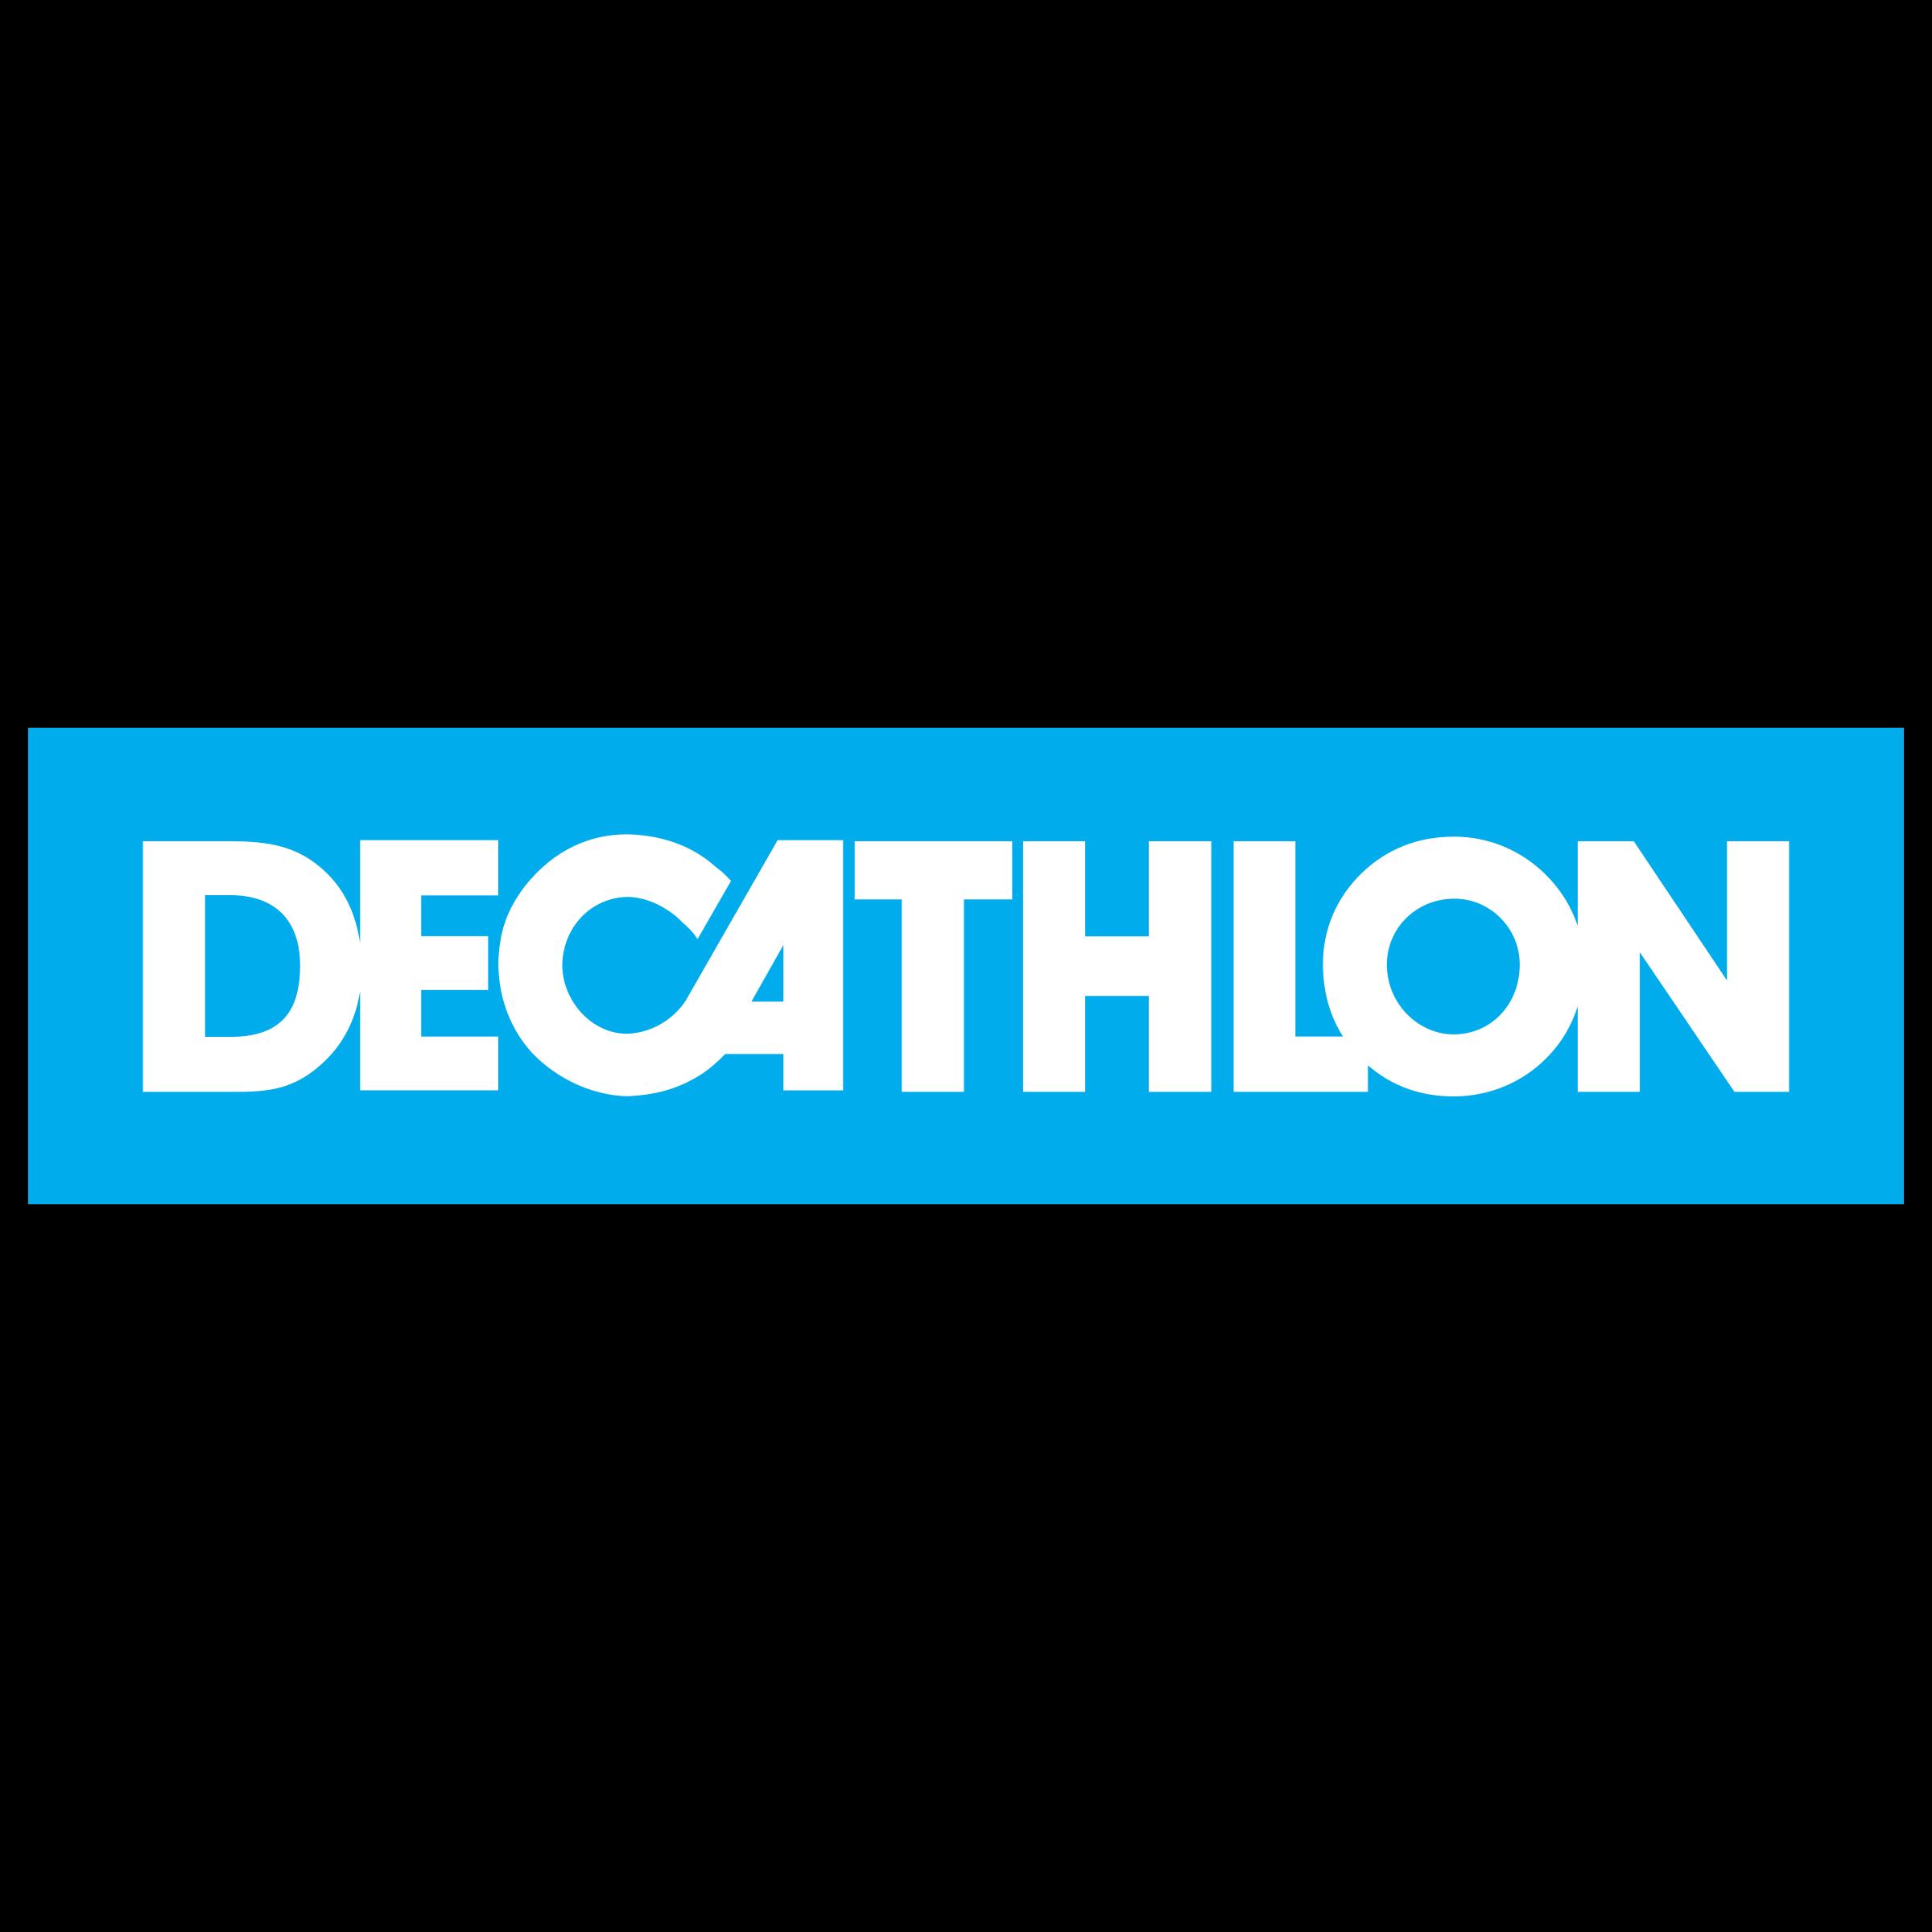 decathlon-logo-png-transparent (1)